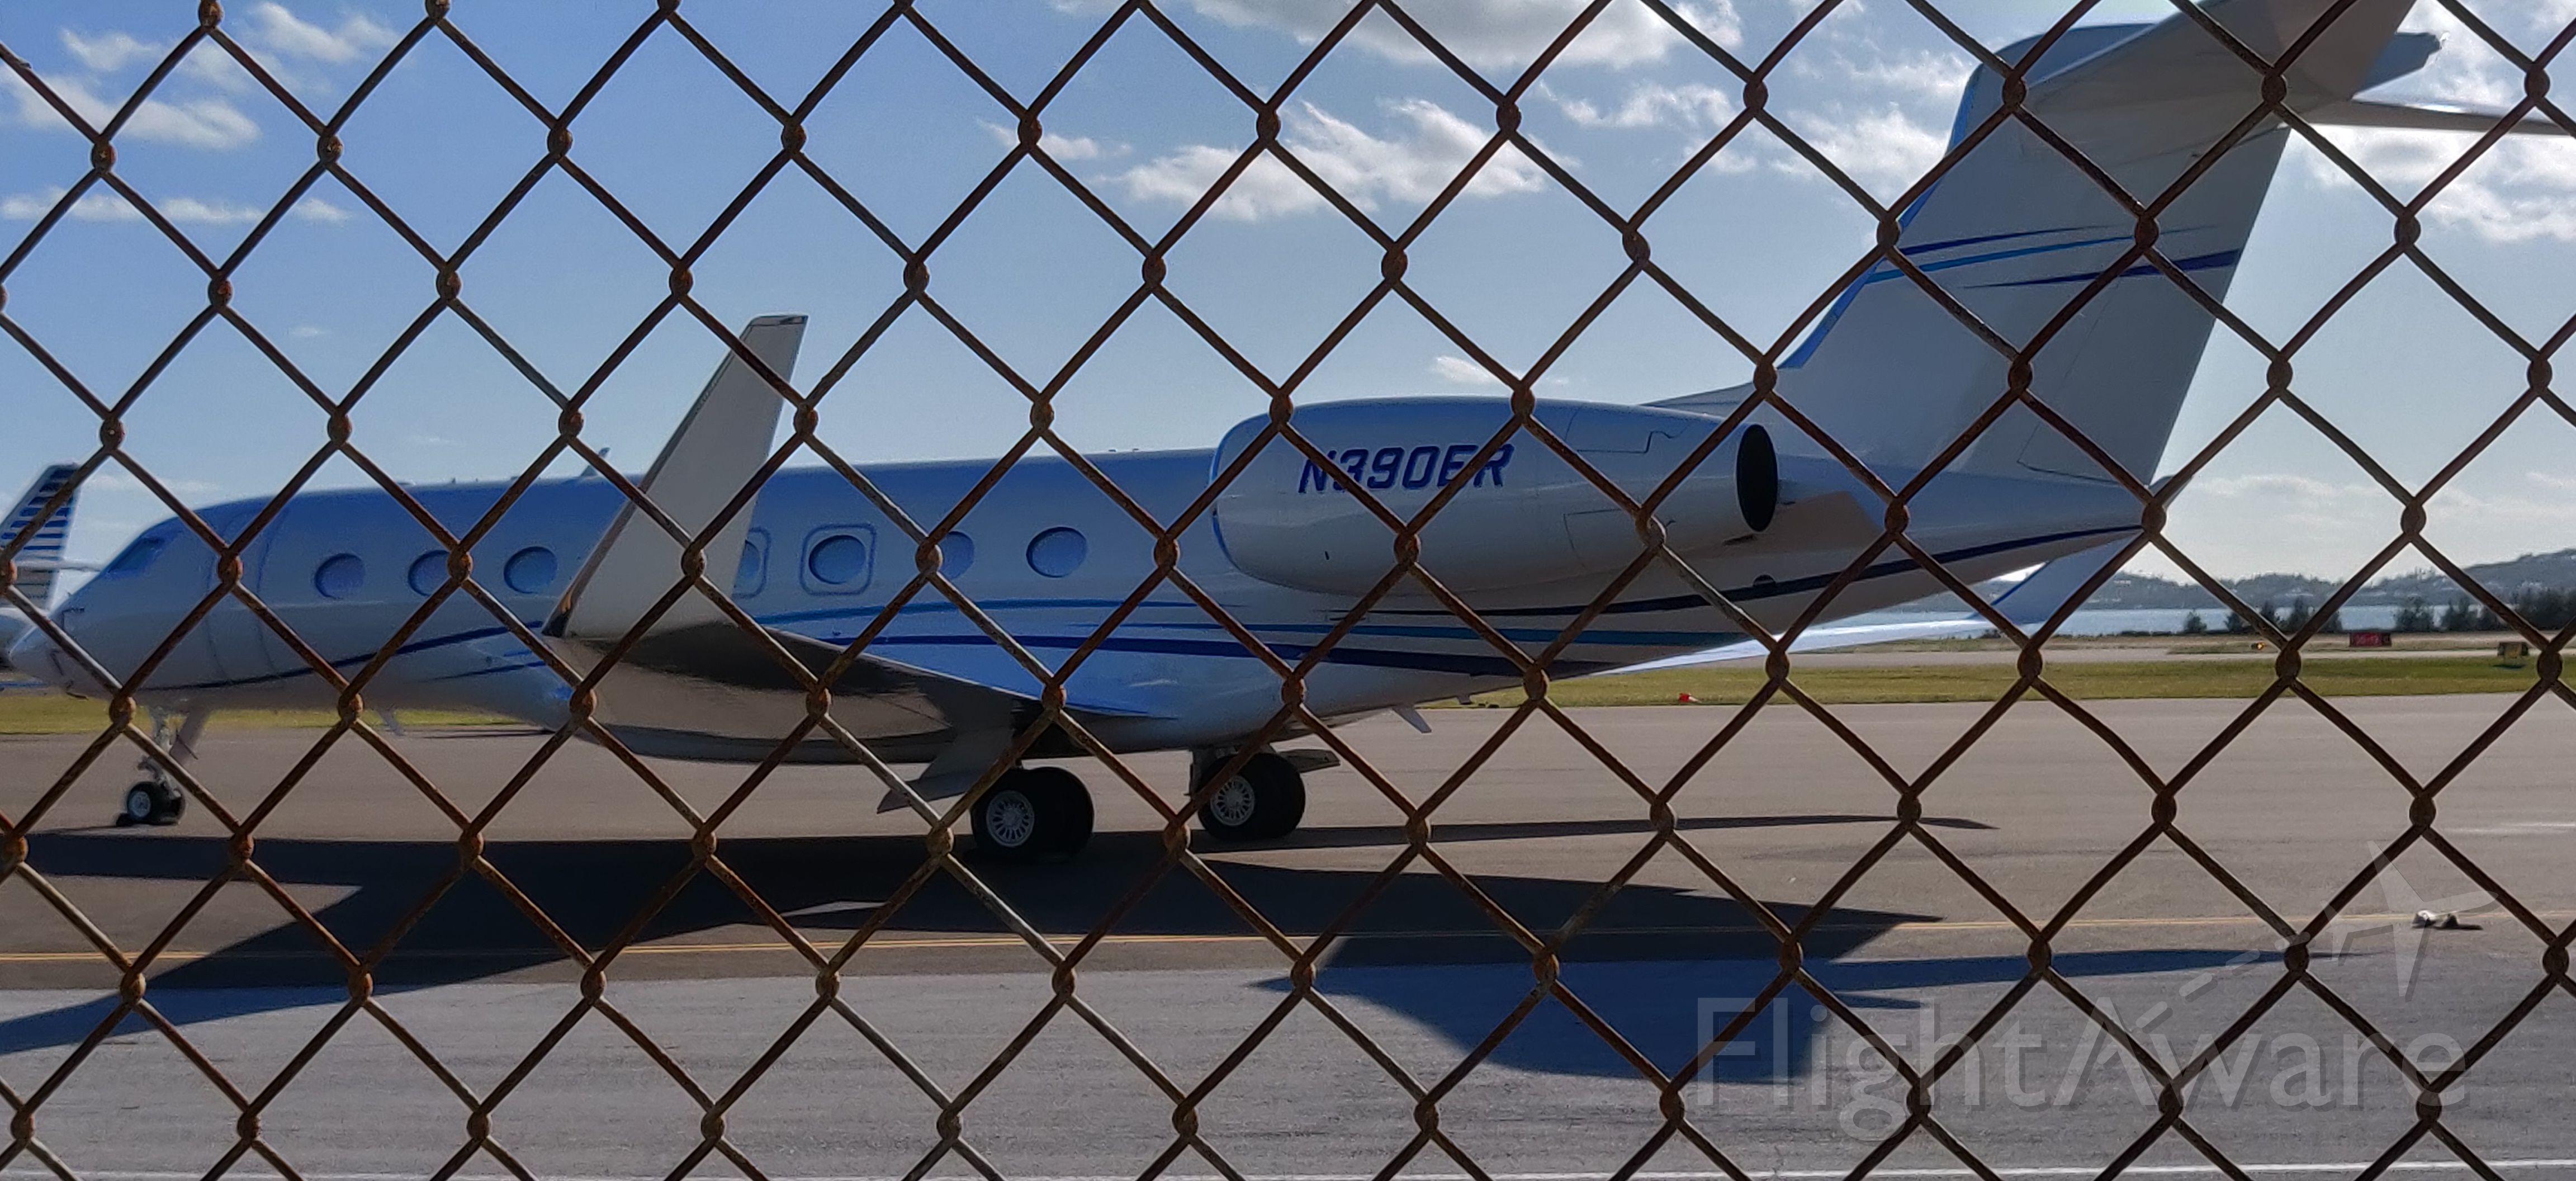 Gulfstream Aerospace Gulfstream G650 (N390ER) - Parked at FBO in Bermuda 10/27/19